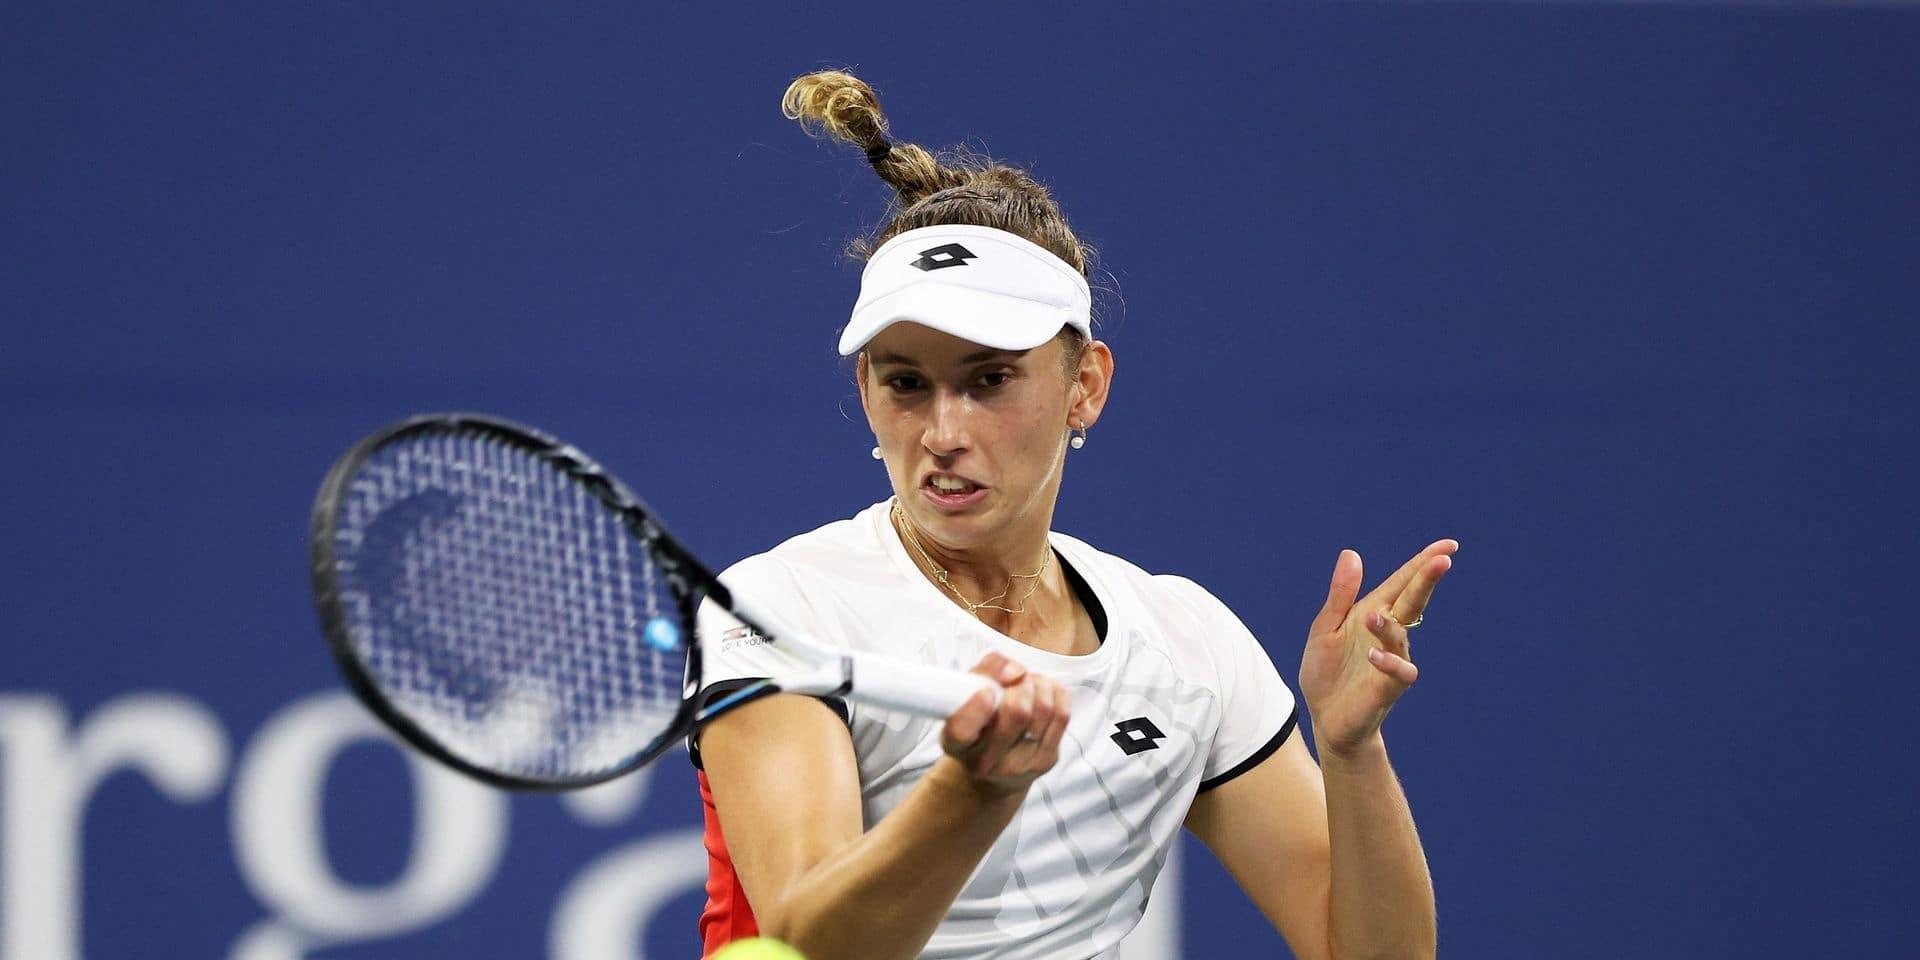 Classement WTA : Elise Mertens recule au 18e rang, Naomi Osaka sort du top 5